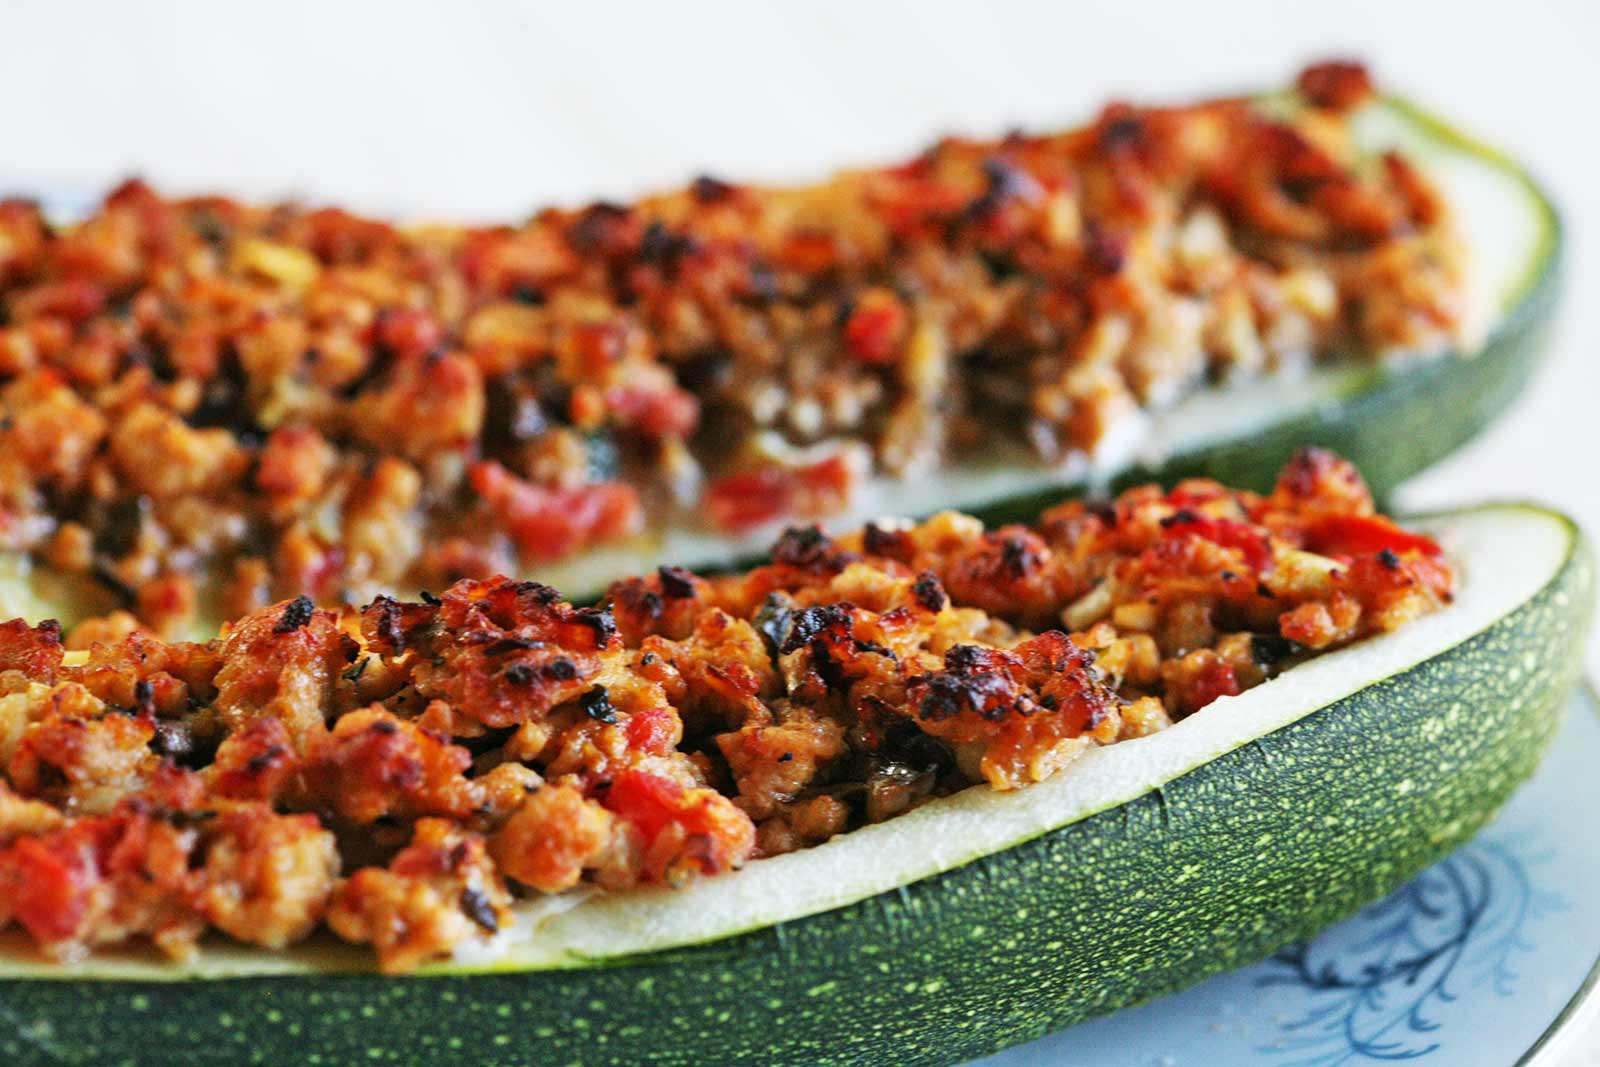 Turkey Sausage Recipes  Stuffed Zucchini with Turkey Sausage Recipe